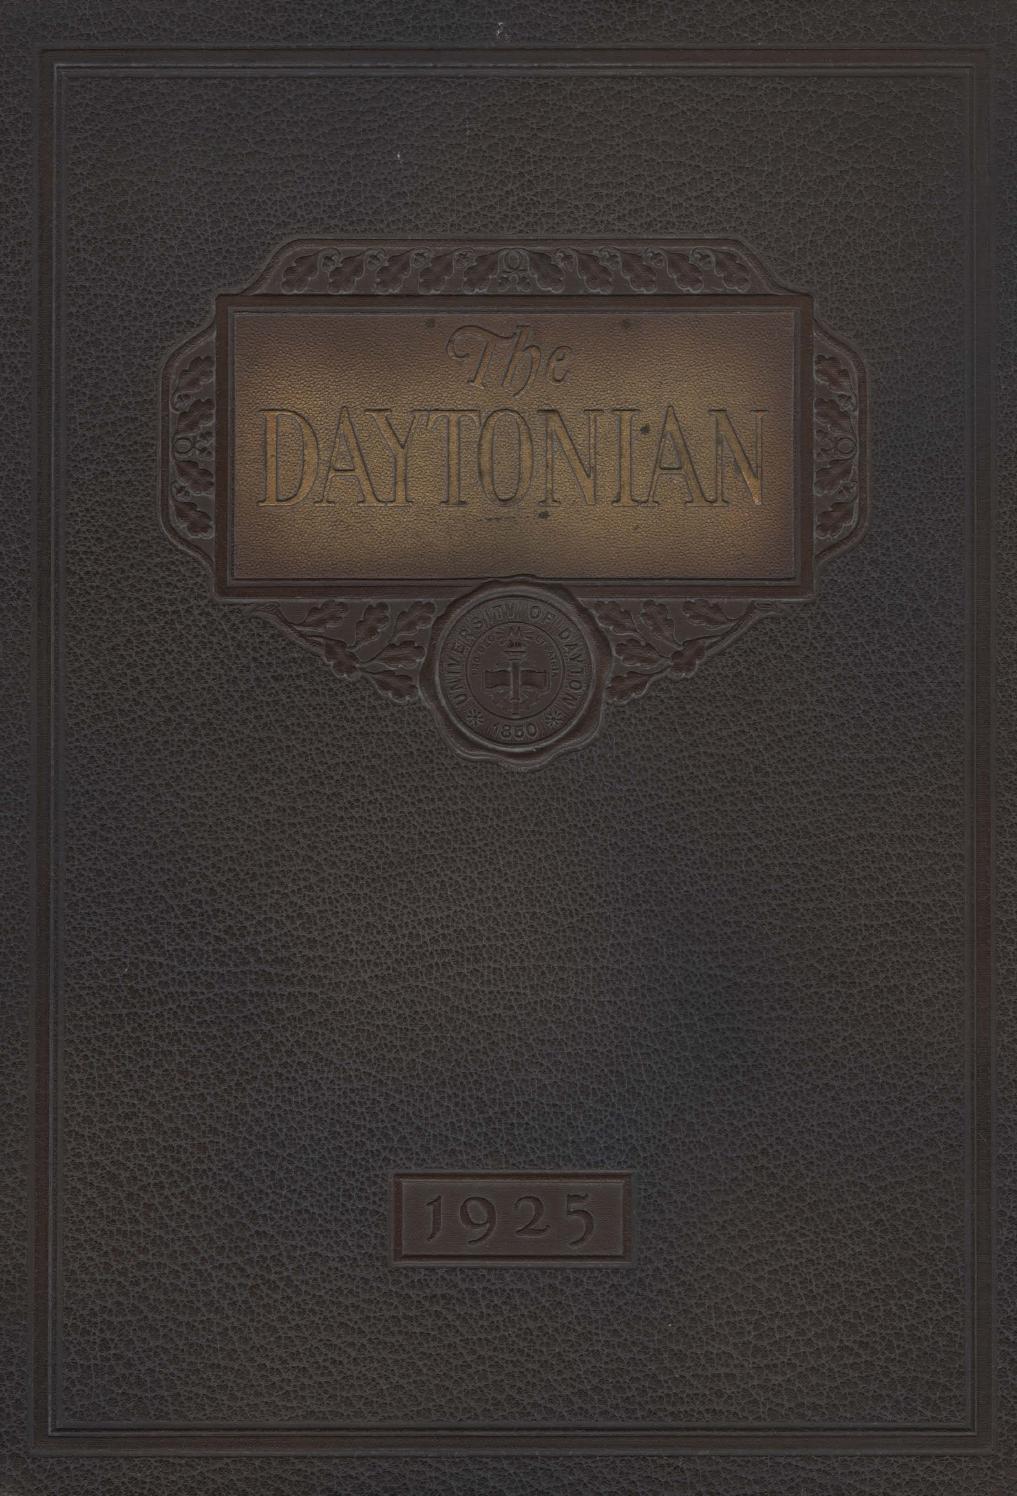 7b28c4339d Daytonian 1925 by eCommons - issuu